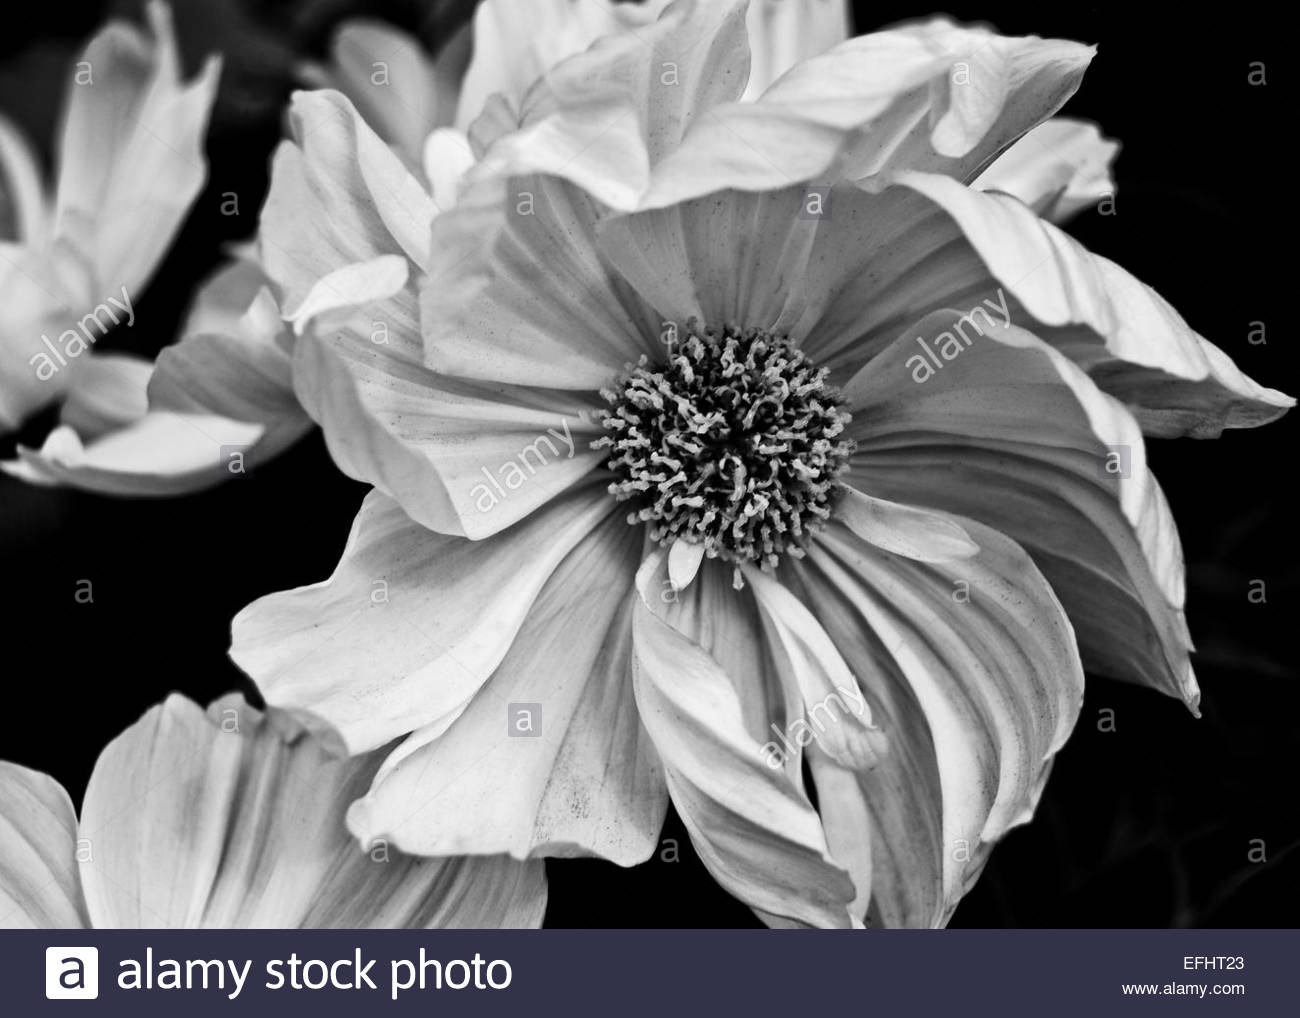 Dahlia Black And White Stock Photos Images Alamy